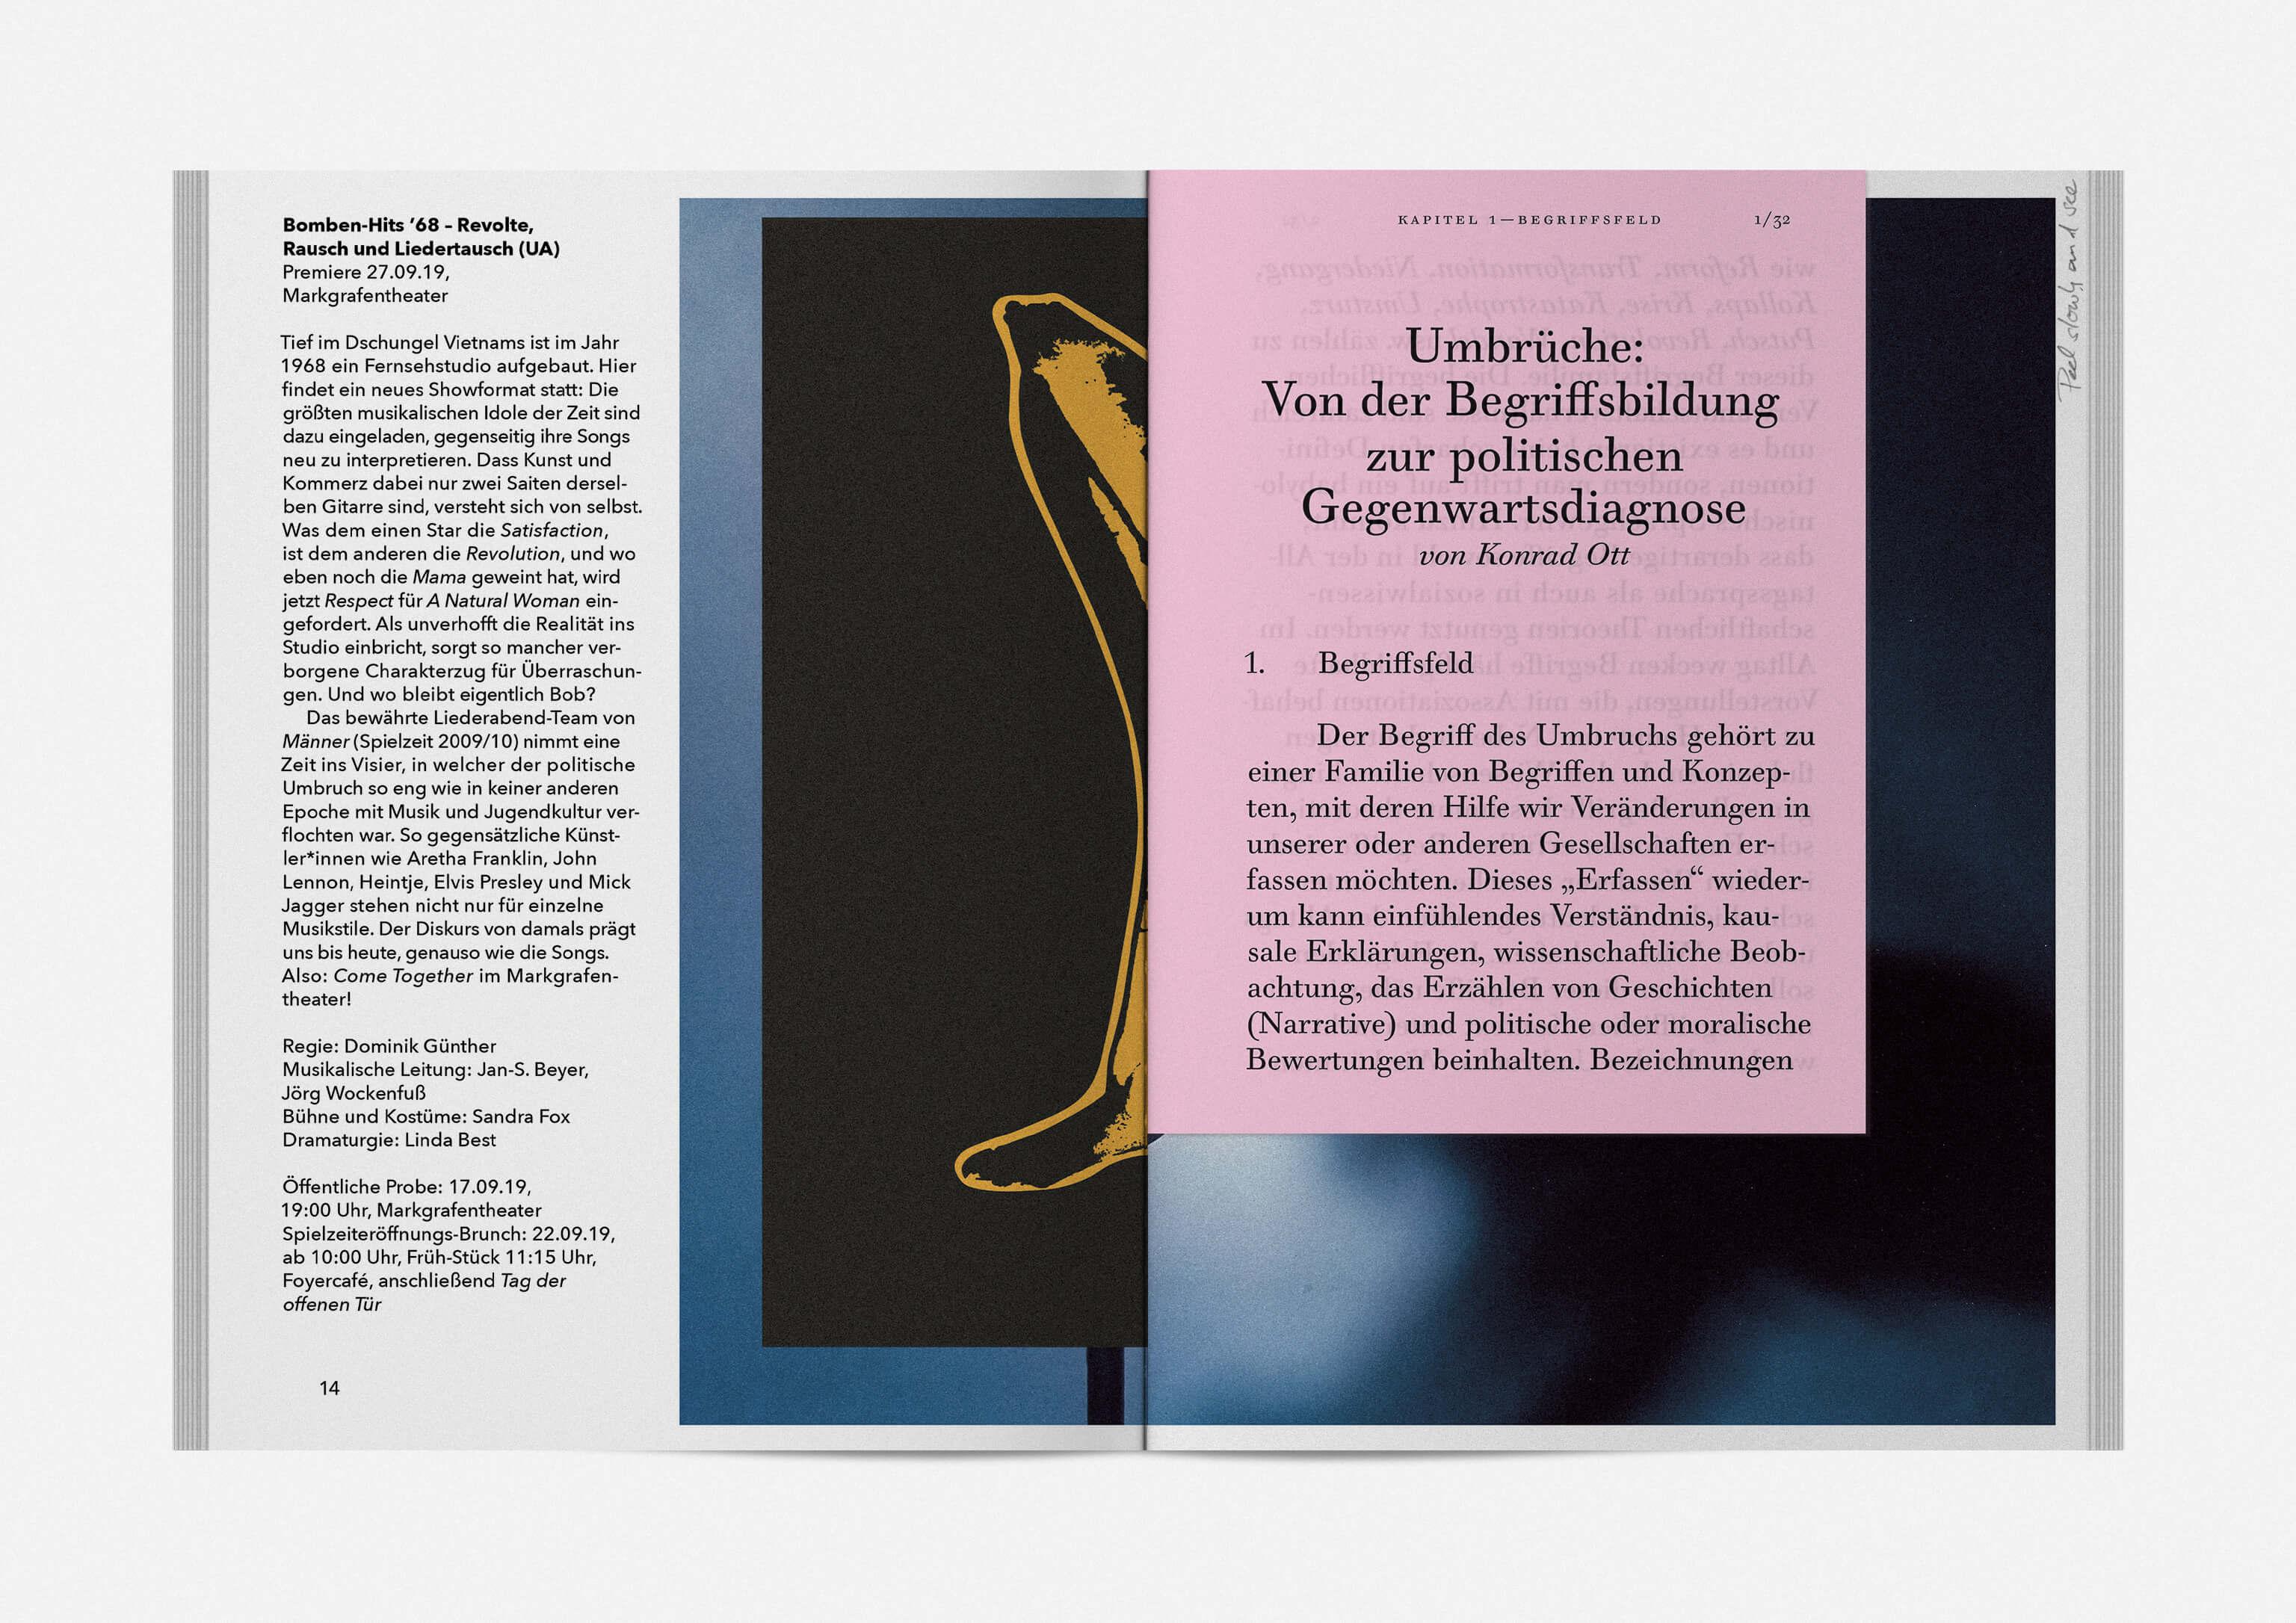 https://neuegestaltung.de/media/pages/clients/theater-erlangen-season-program-19-20/16150155fb-1597415337/te_szh_19_20_innenseite_14_15_a_ng.jpg